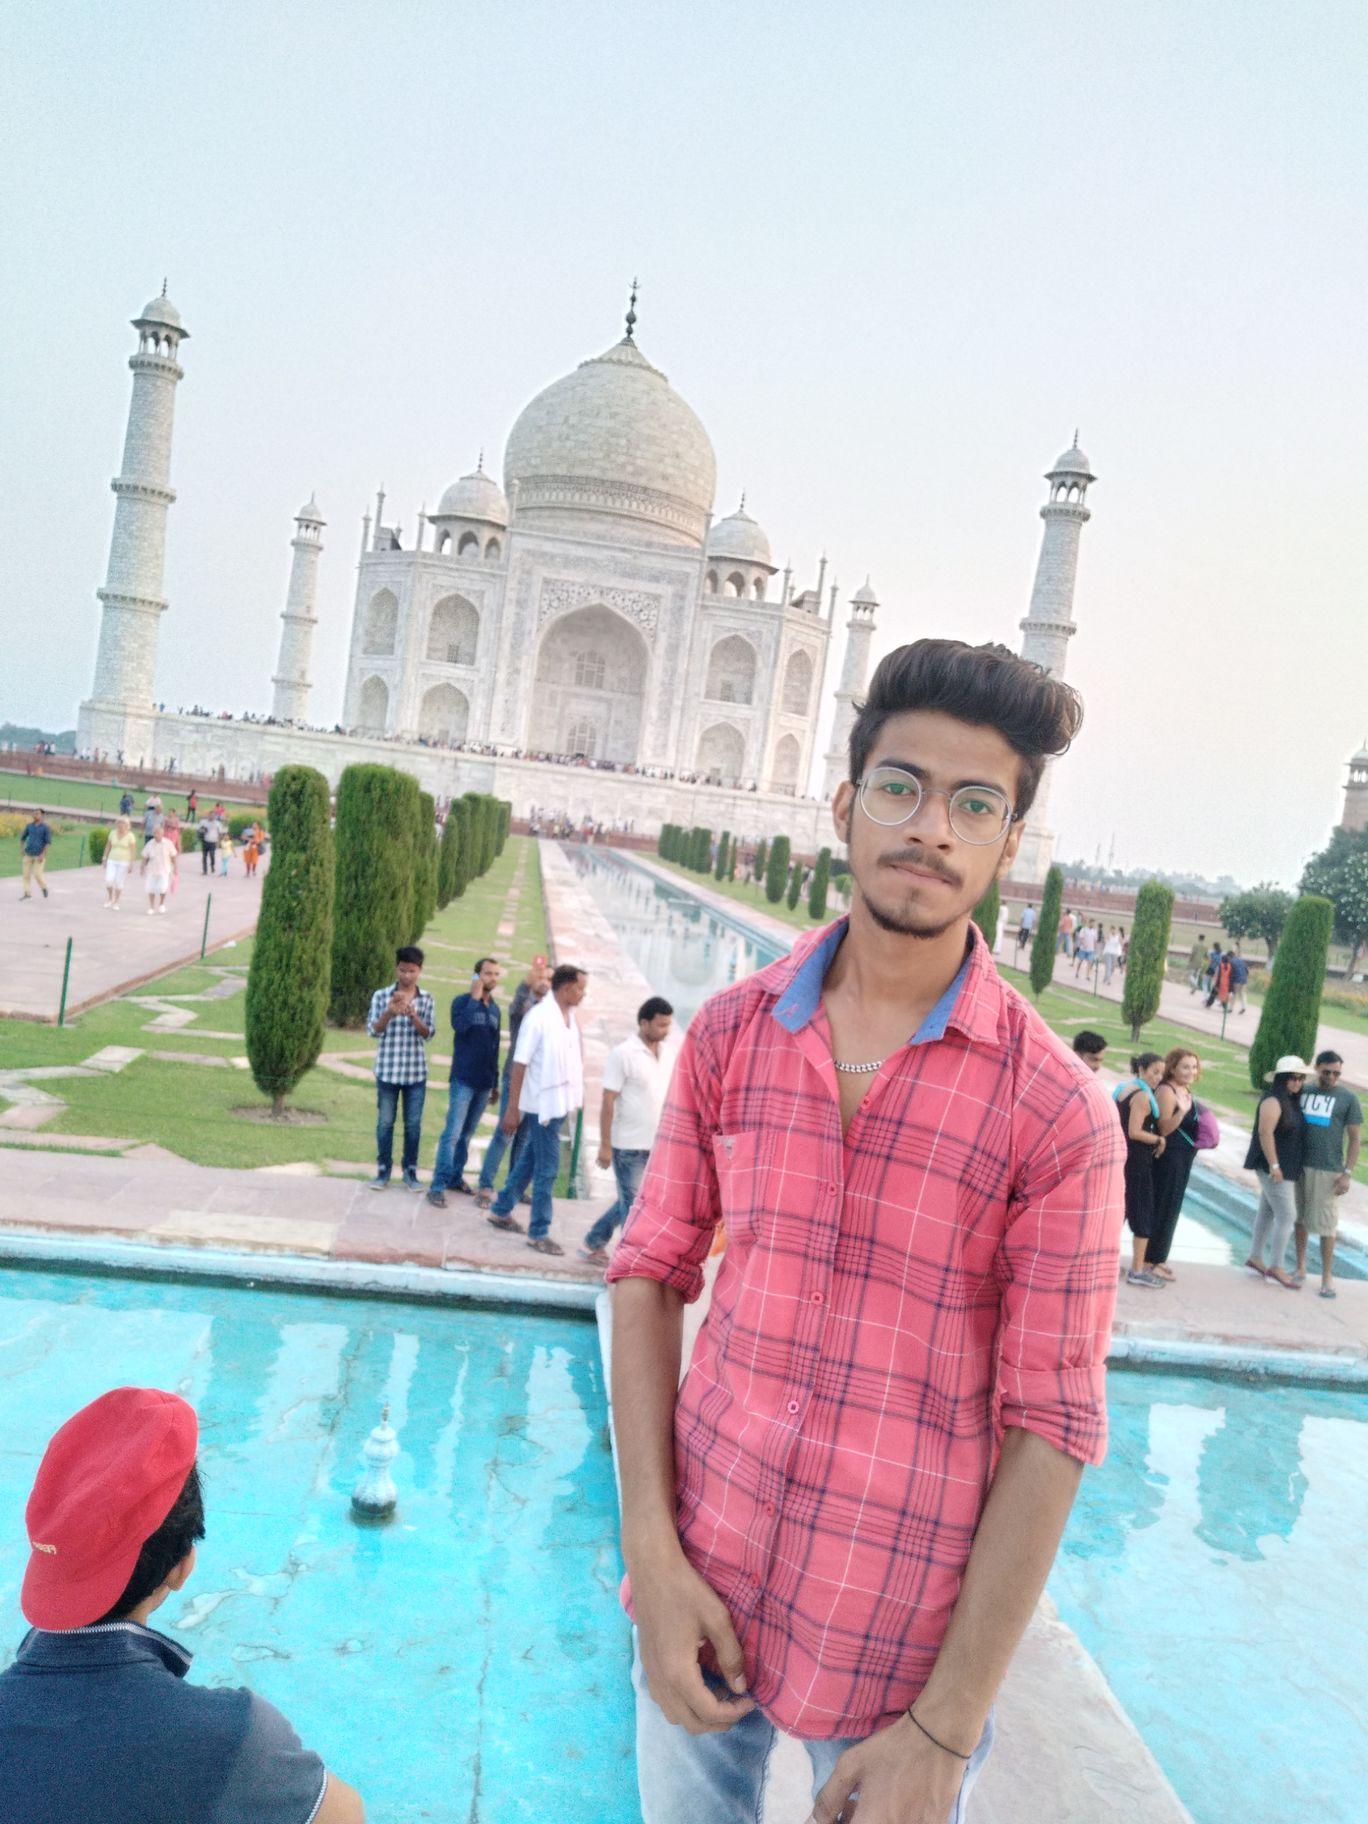 Photo of Taj Mahal By Gyandeep Rohilla